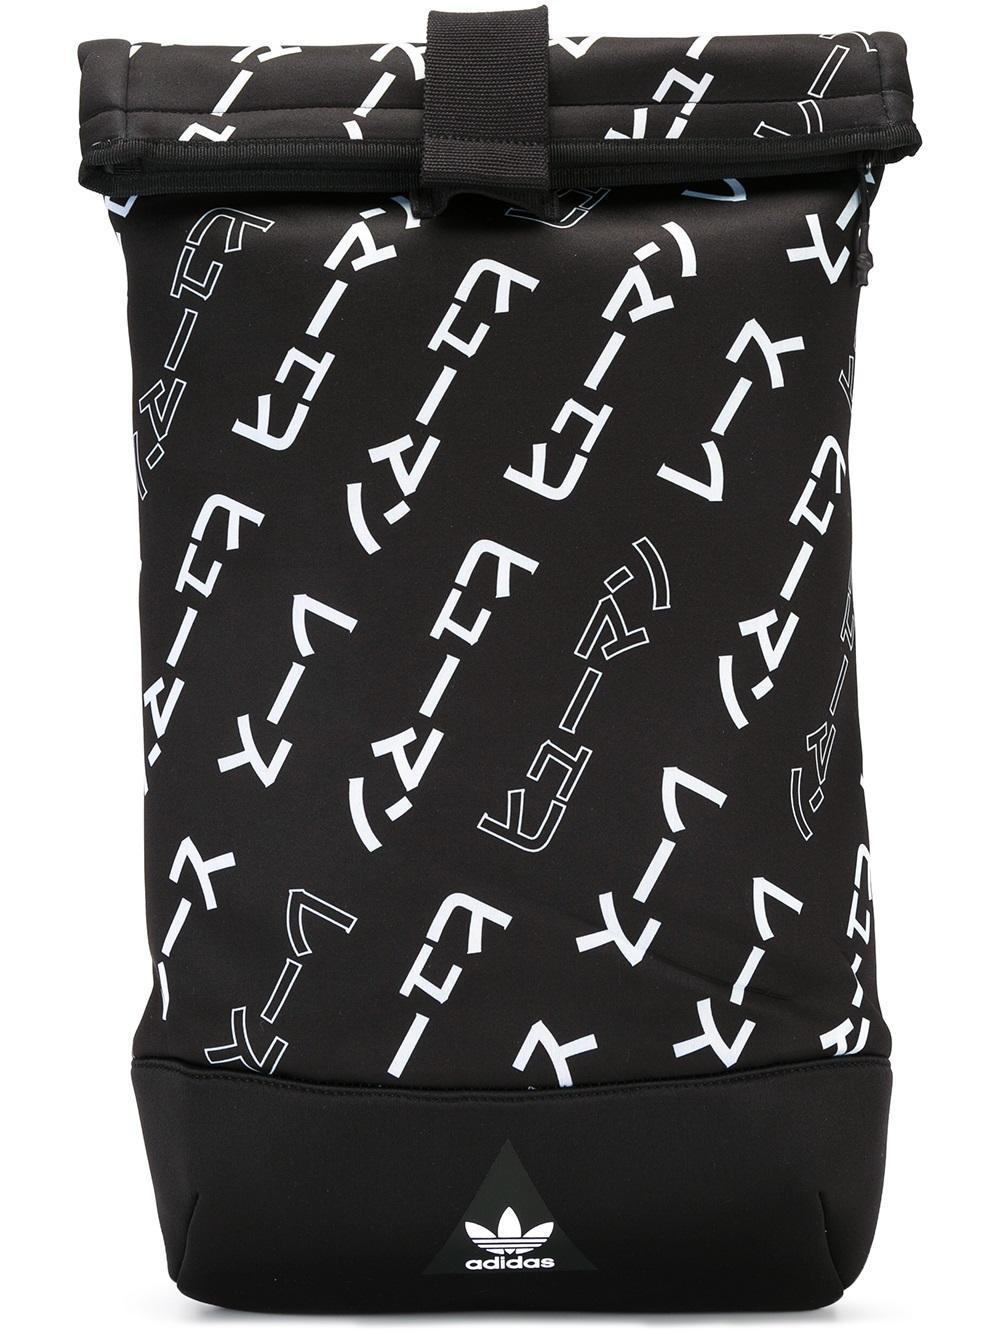 4e0340e942 adidas Originals Hu Roll-up Backpack in Black for Men - Lyst